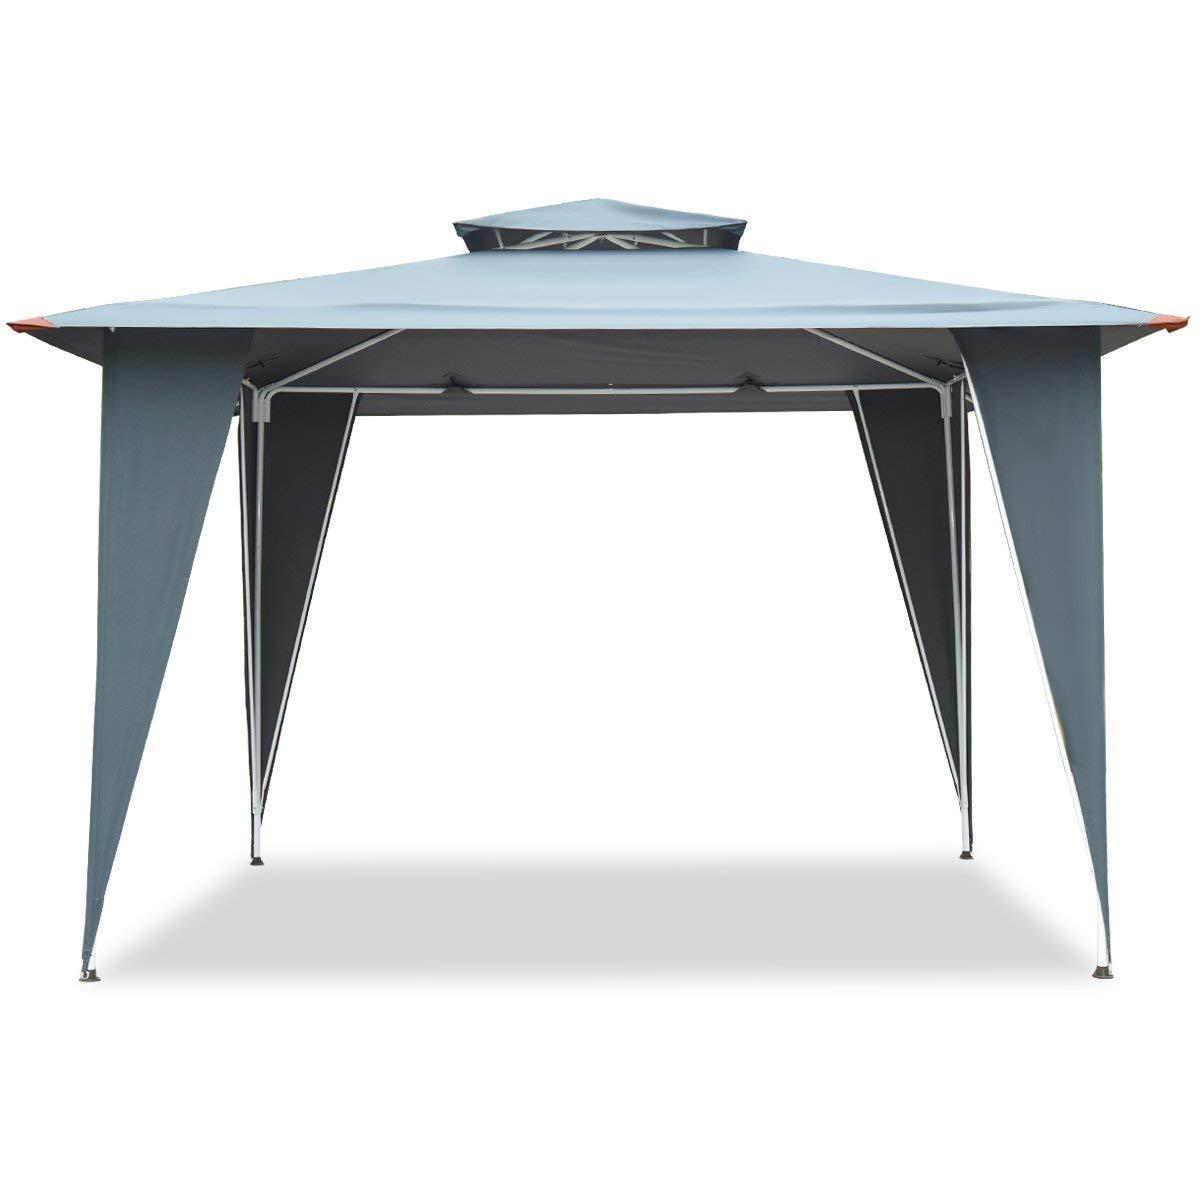 TANGKULA 2 Tier 11.5'x11.5' Gazebo Canopy Shelter Awning Tent Steel Frame Patio Garden Gray